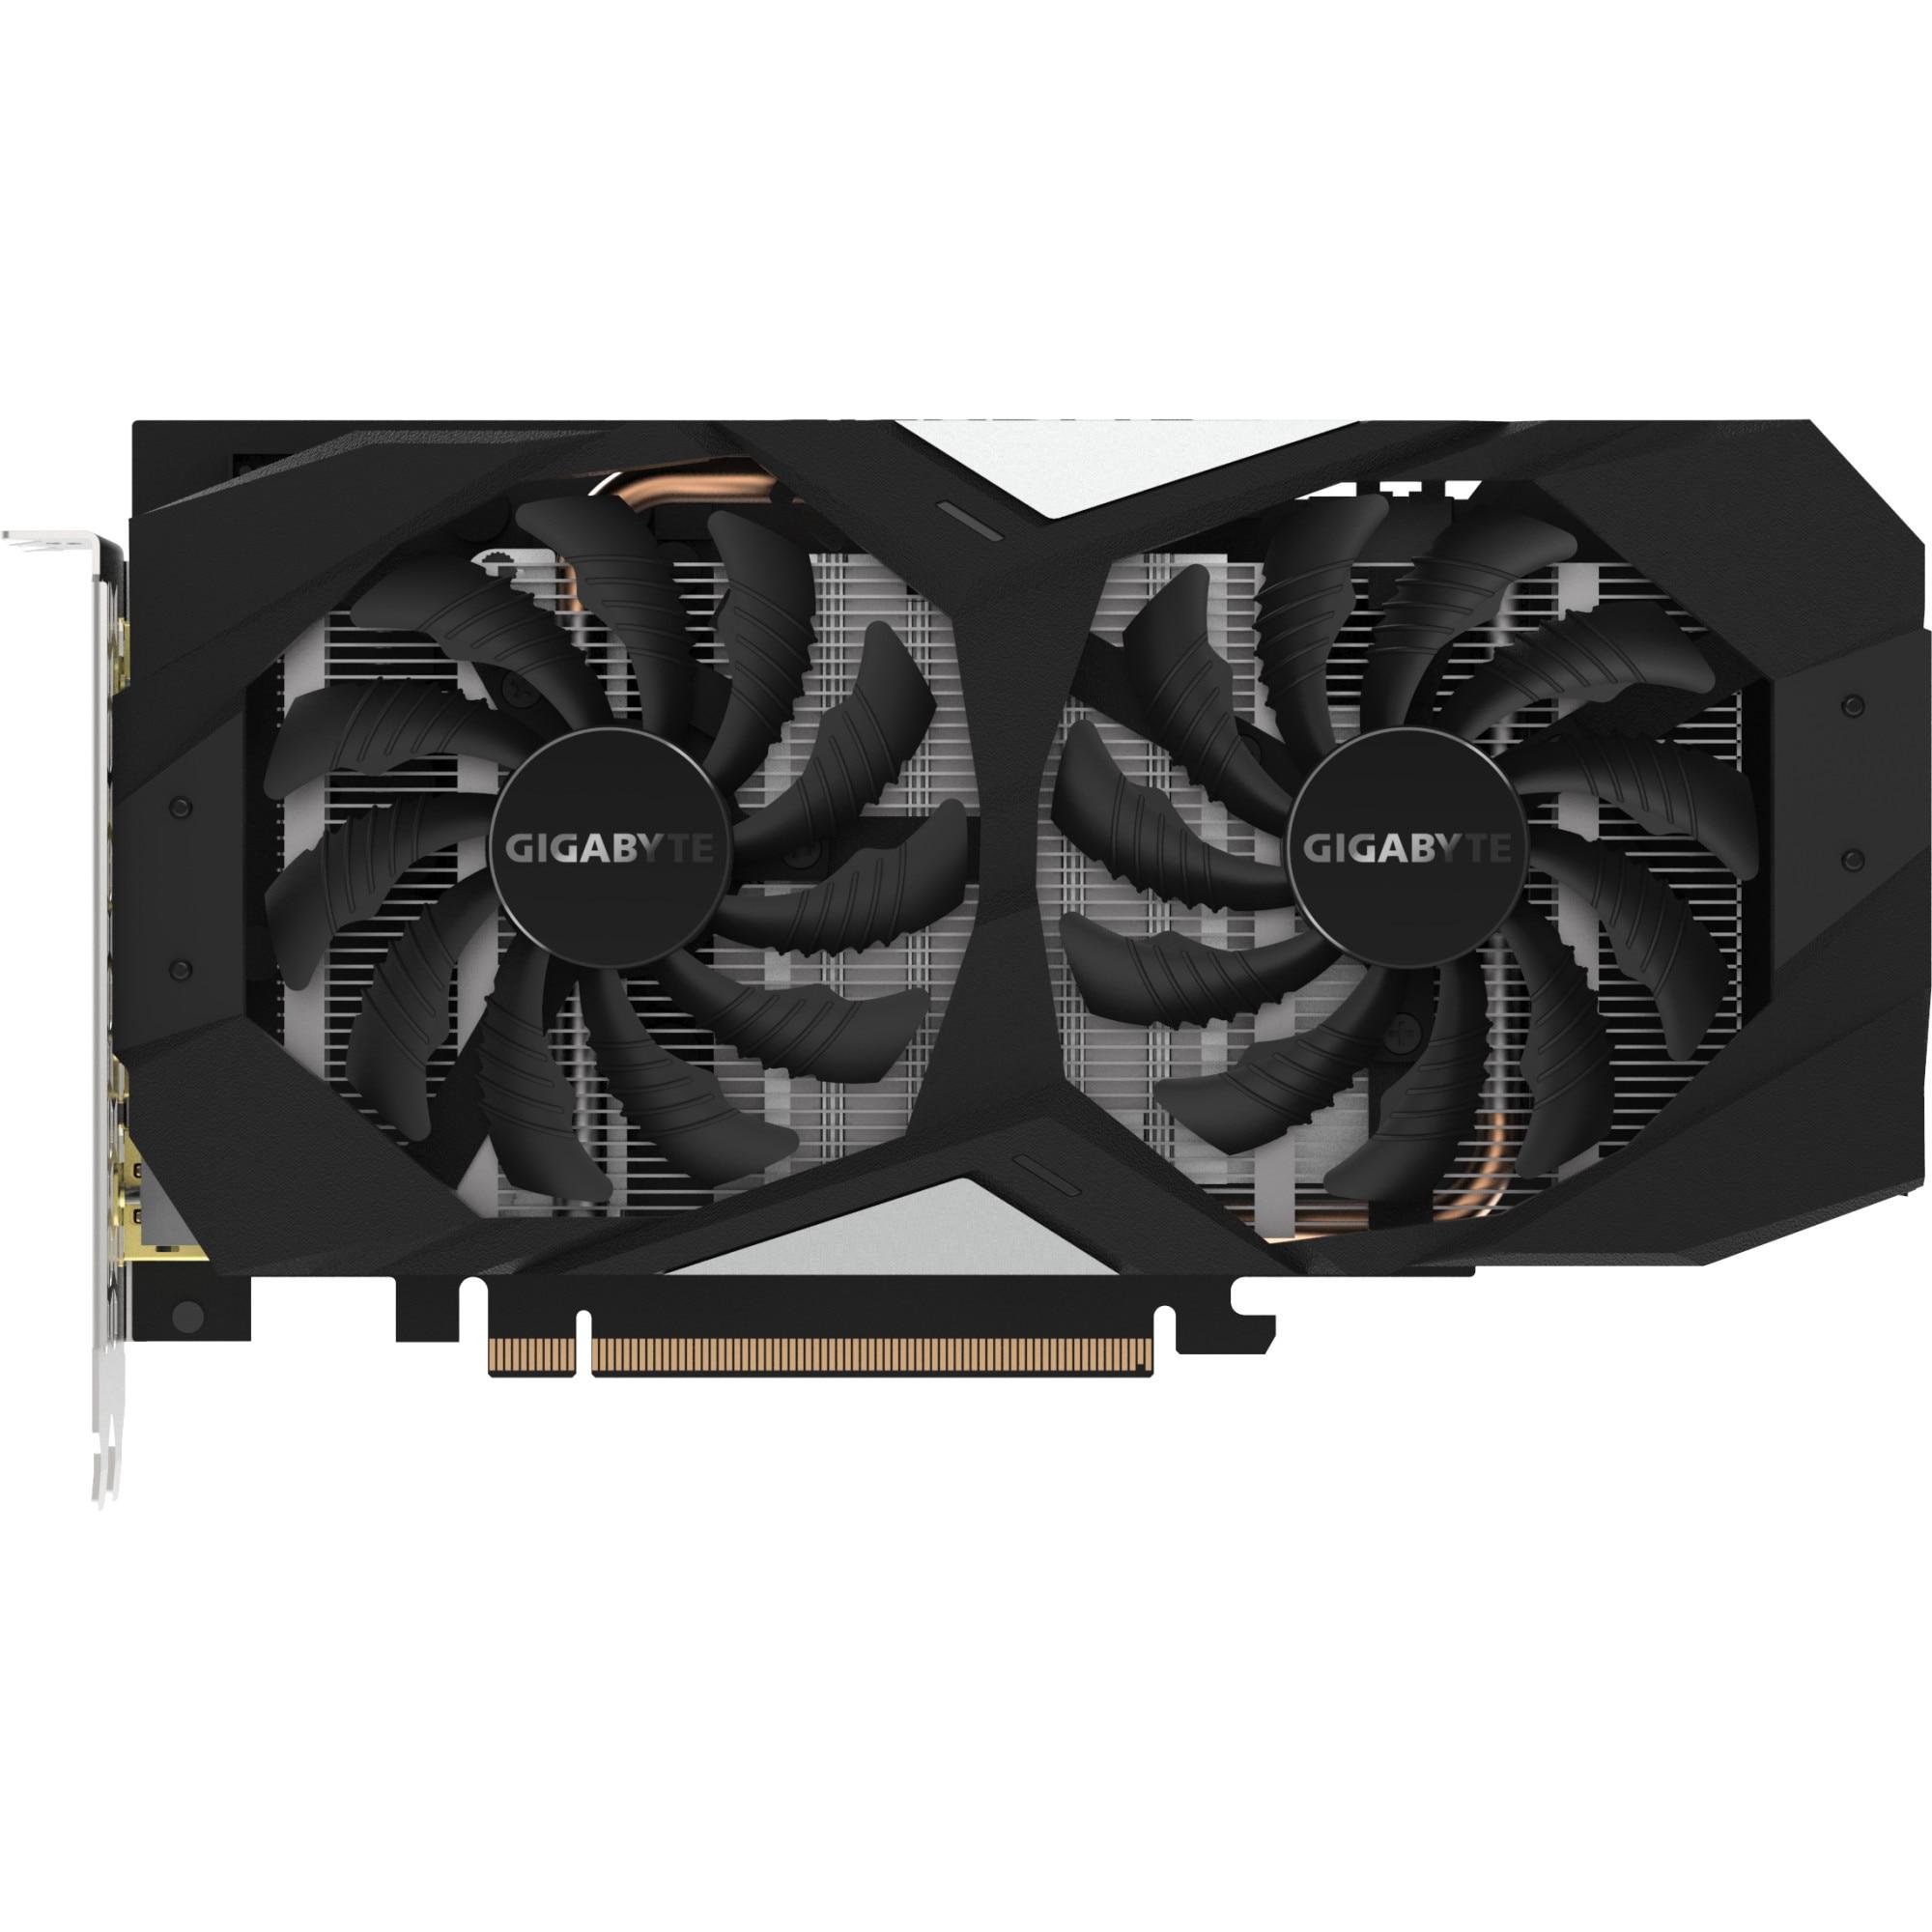 Fotografie Placa video Gigabyte GeForce GTX 1660 OC, 6GB GDDR5, 192-bit